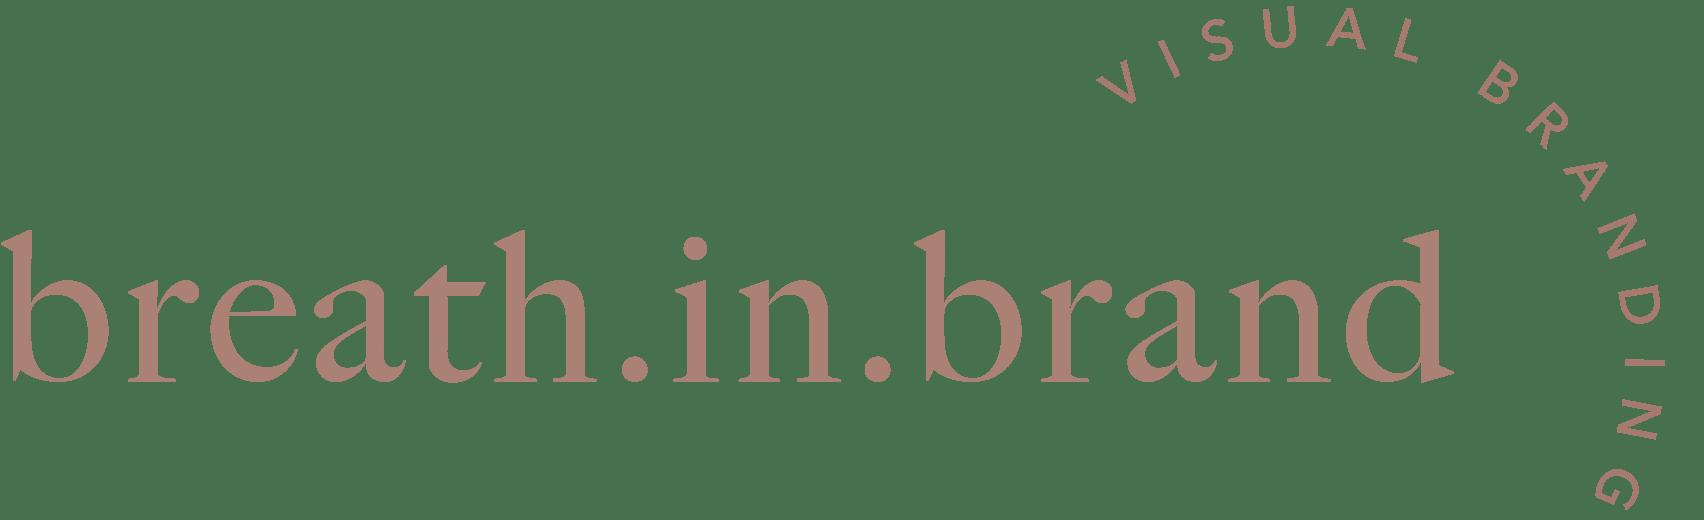 Breath in brand